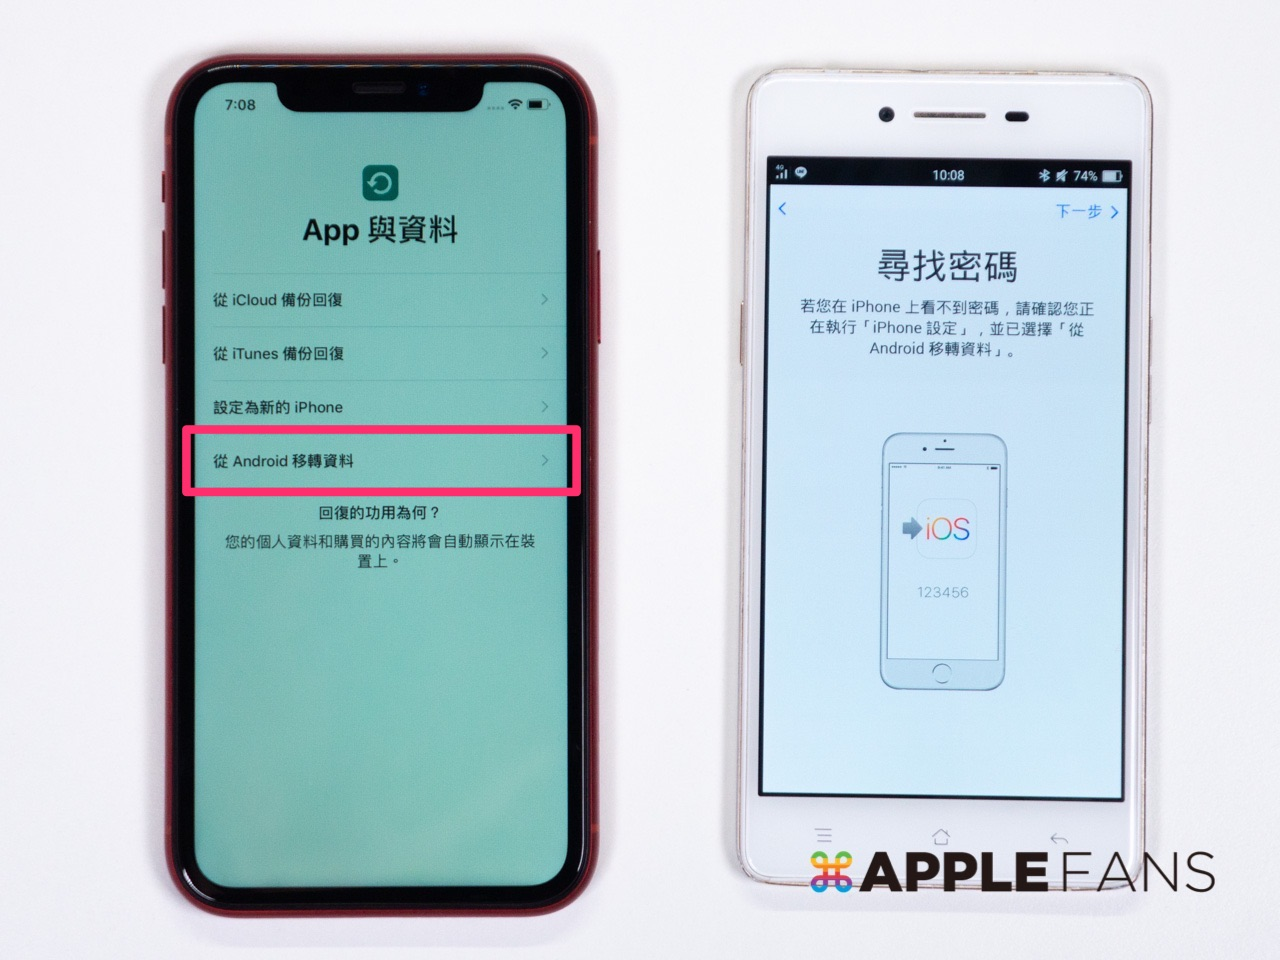 Android 轉 iOS 超簡單!用 Move to iOS 輕鬆轉移資料到 iPhone – APPLEFANS 蘋果迷